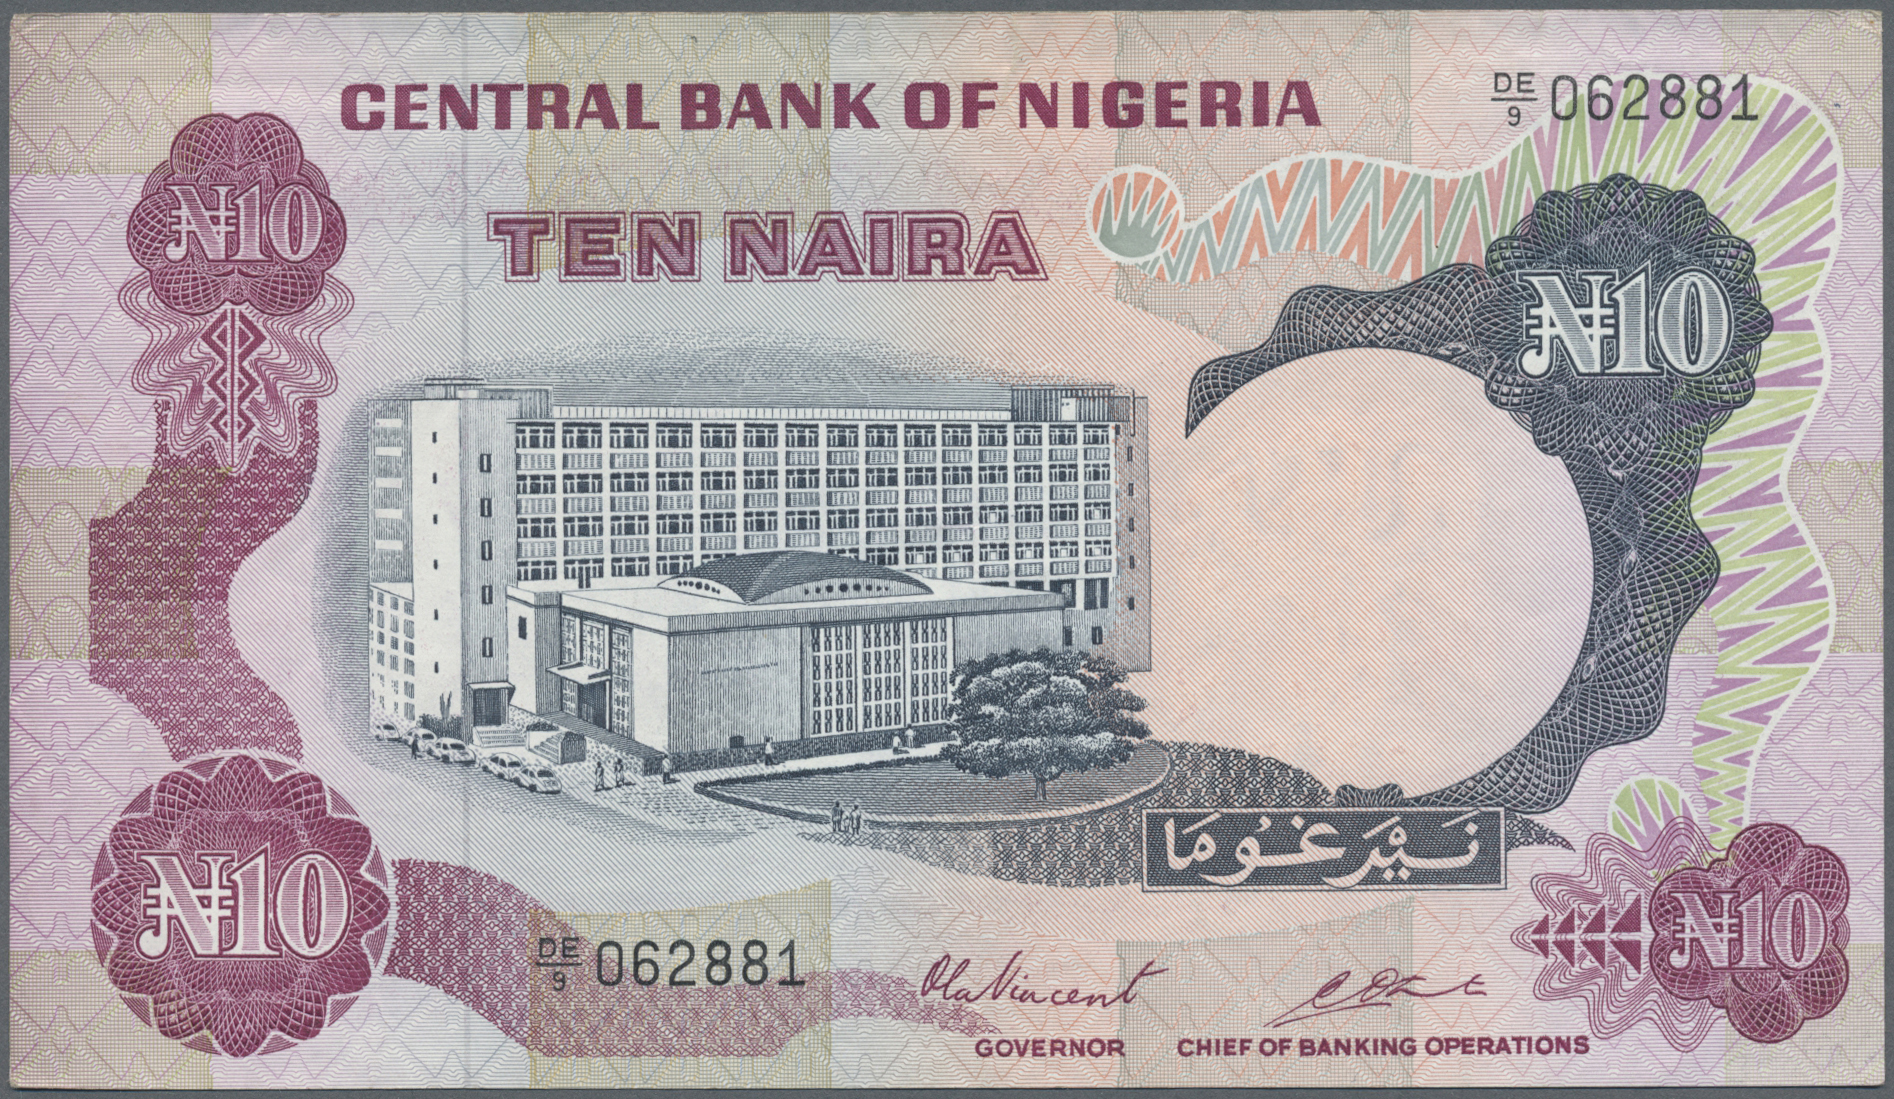 Stamp Auction - Nigeria | Banknoten - Banknotes & Coins